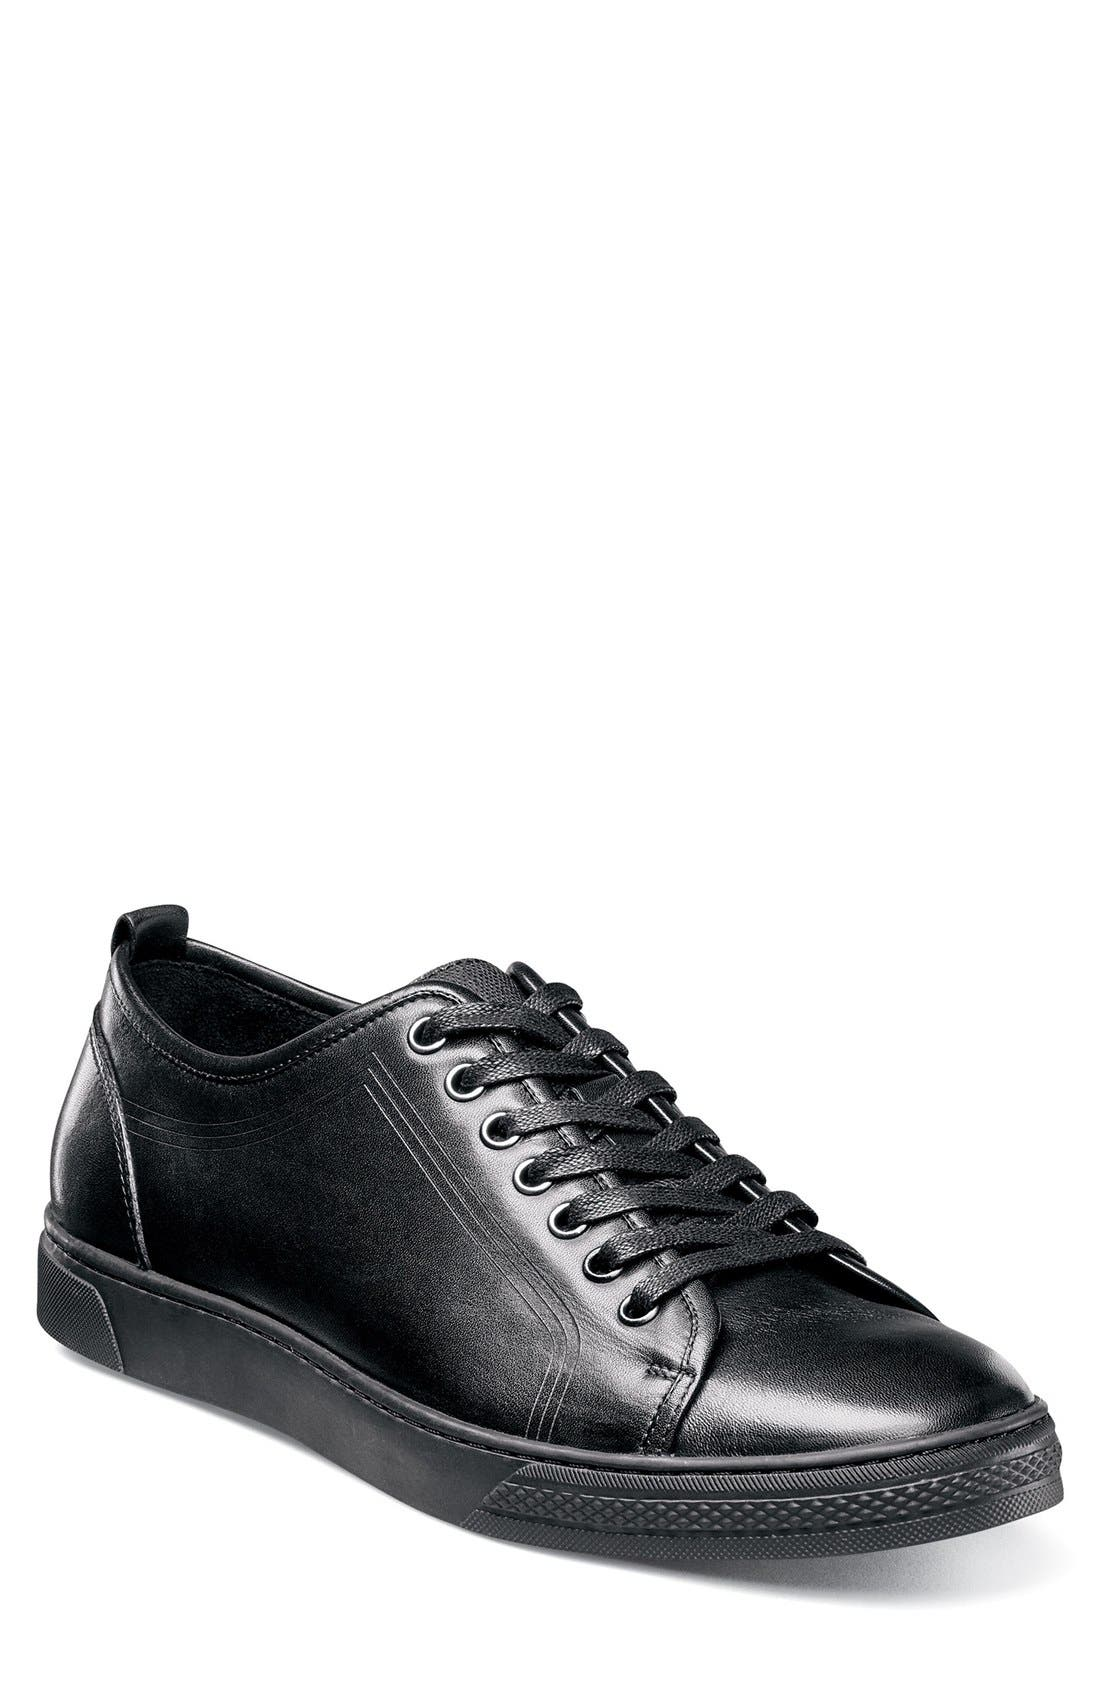 Forward Lo Sneaker,                             Main thumbnail 2, color,